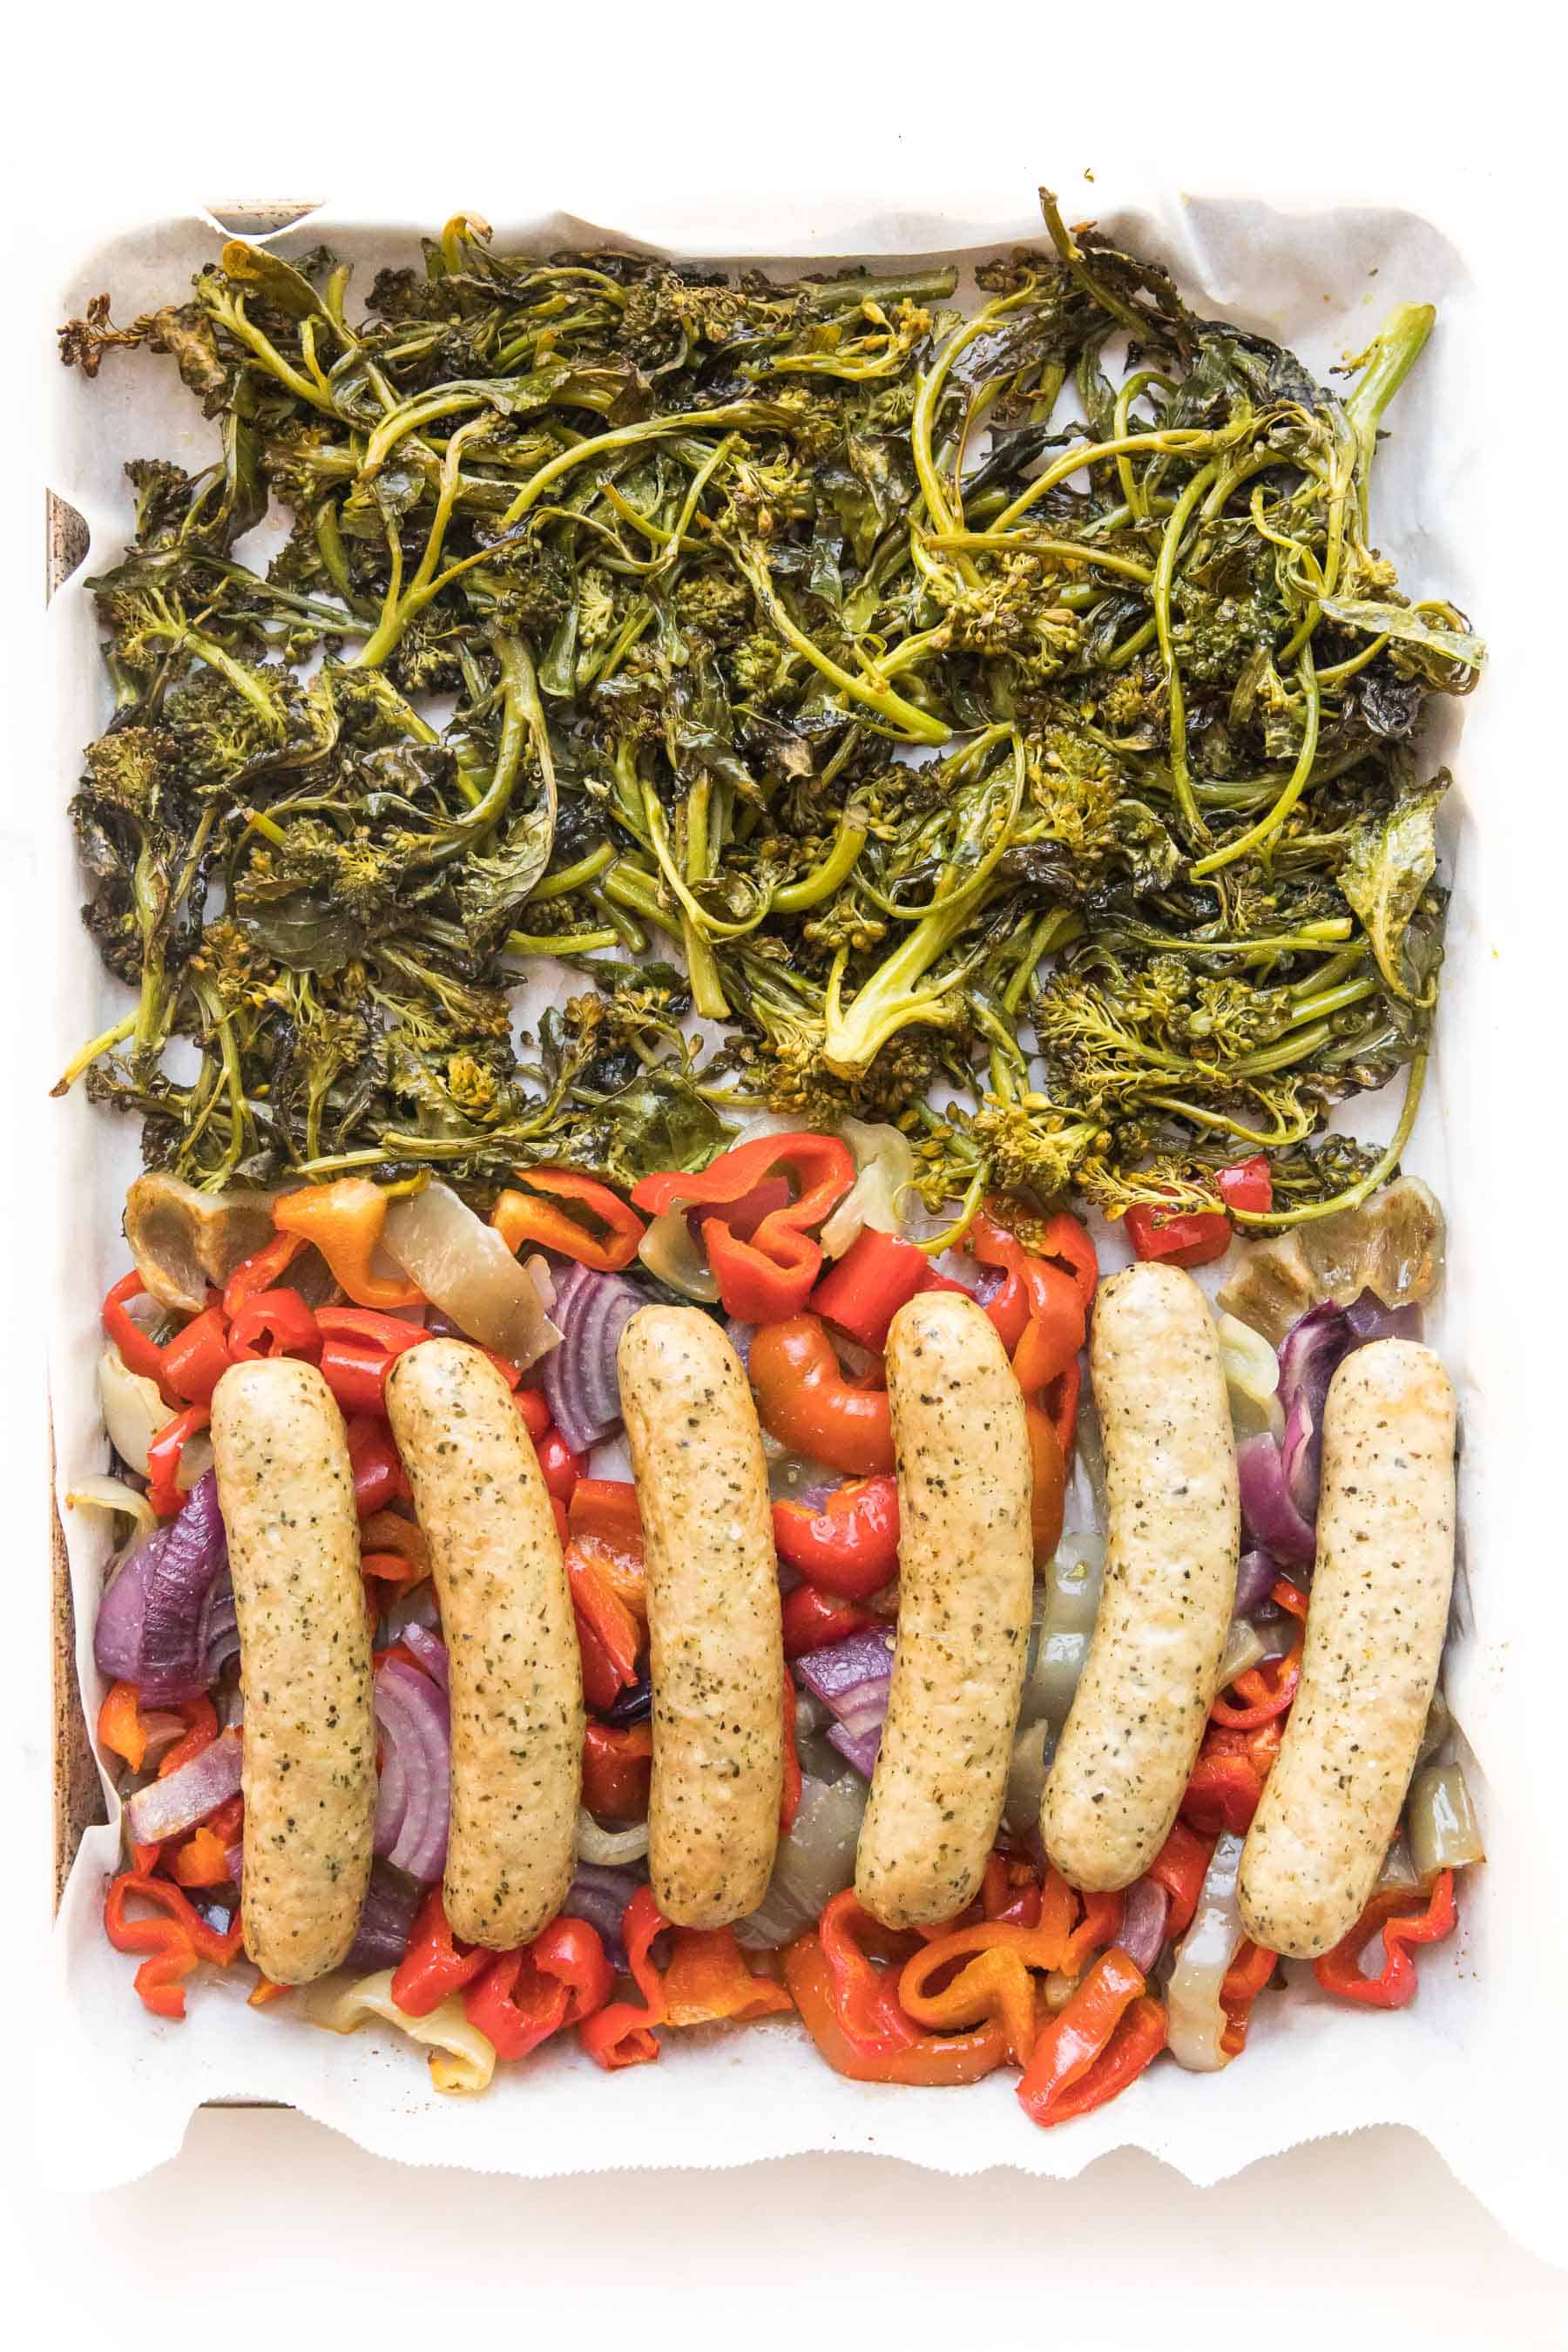 sausages and veggies on a sheet pan